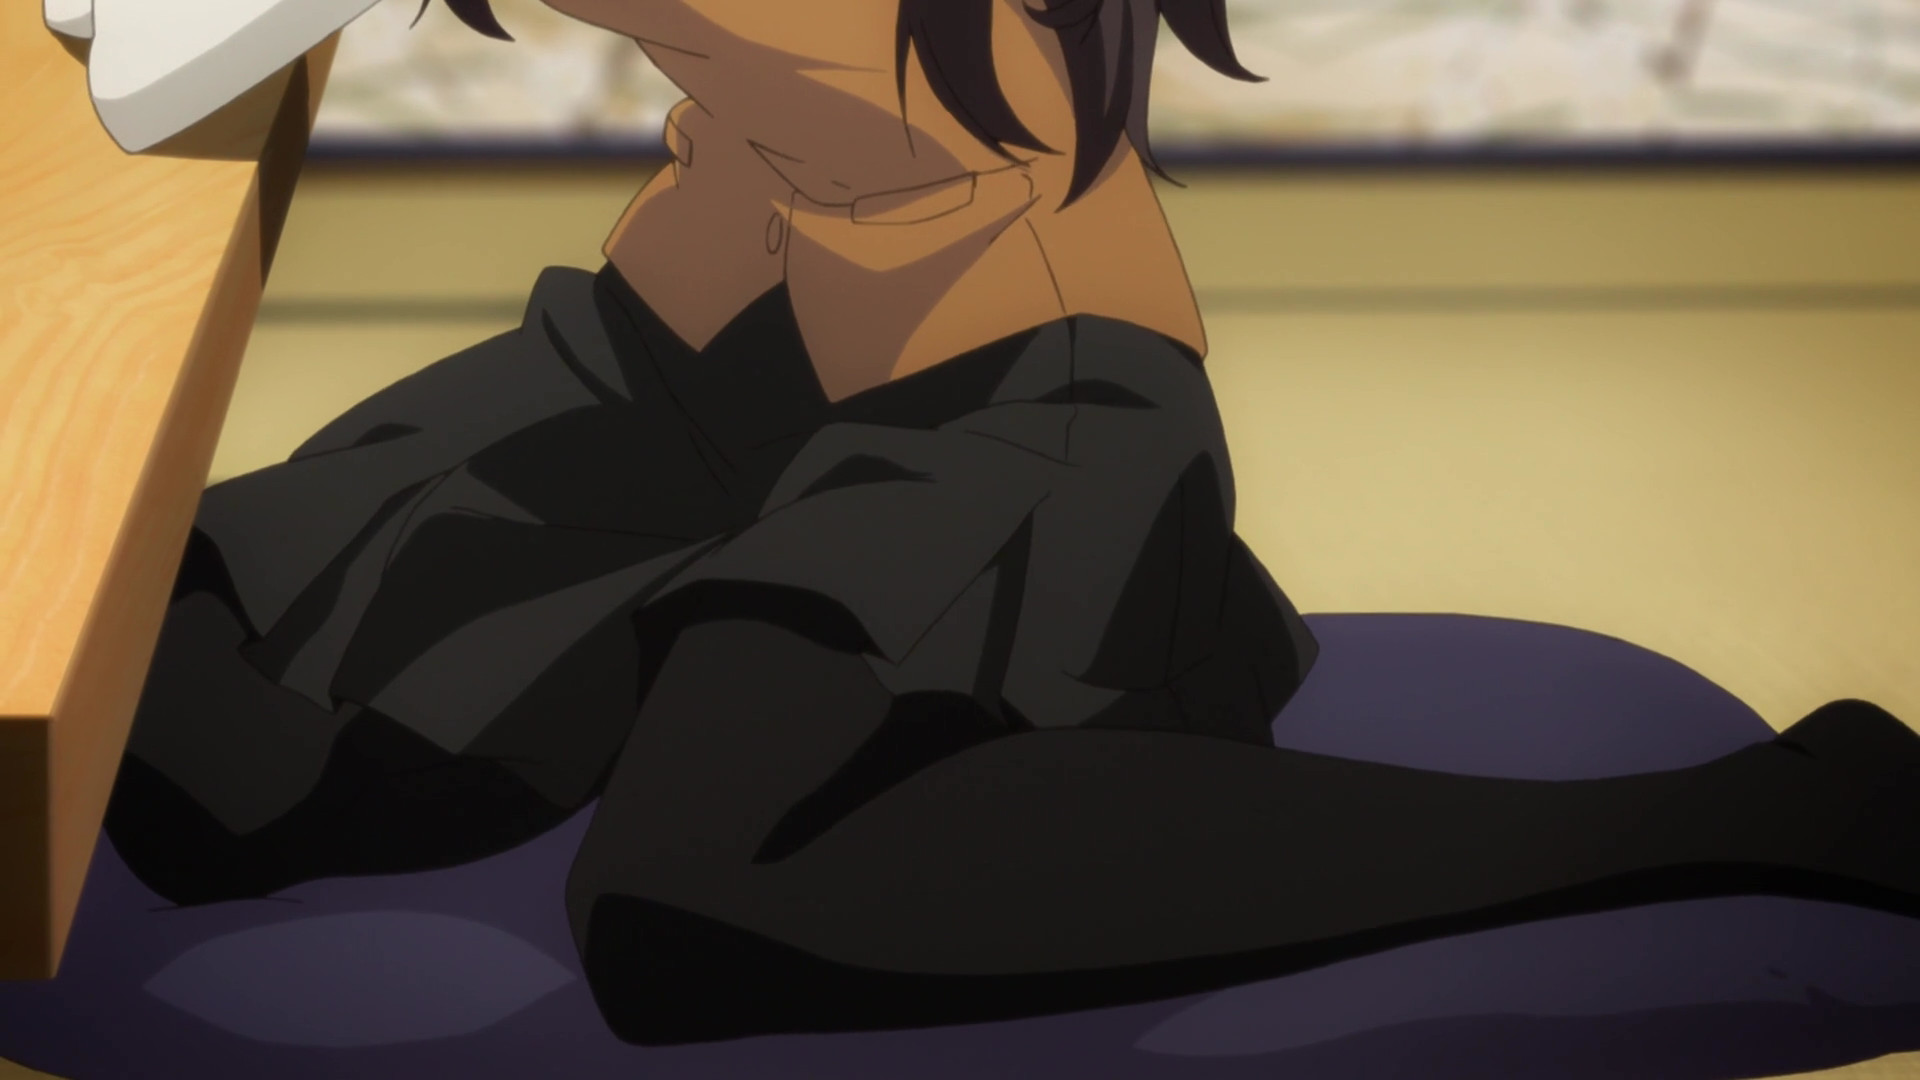 Fate/stay night UBW 番外編 「凛の足について」 海外の感想   海外の ...